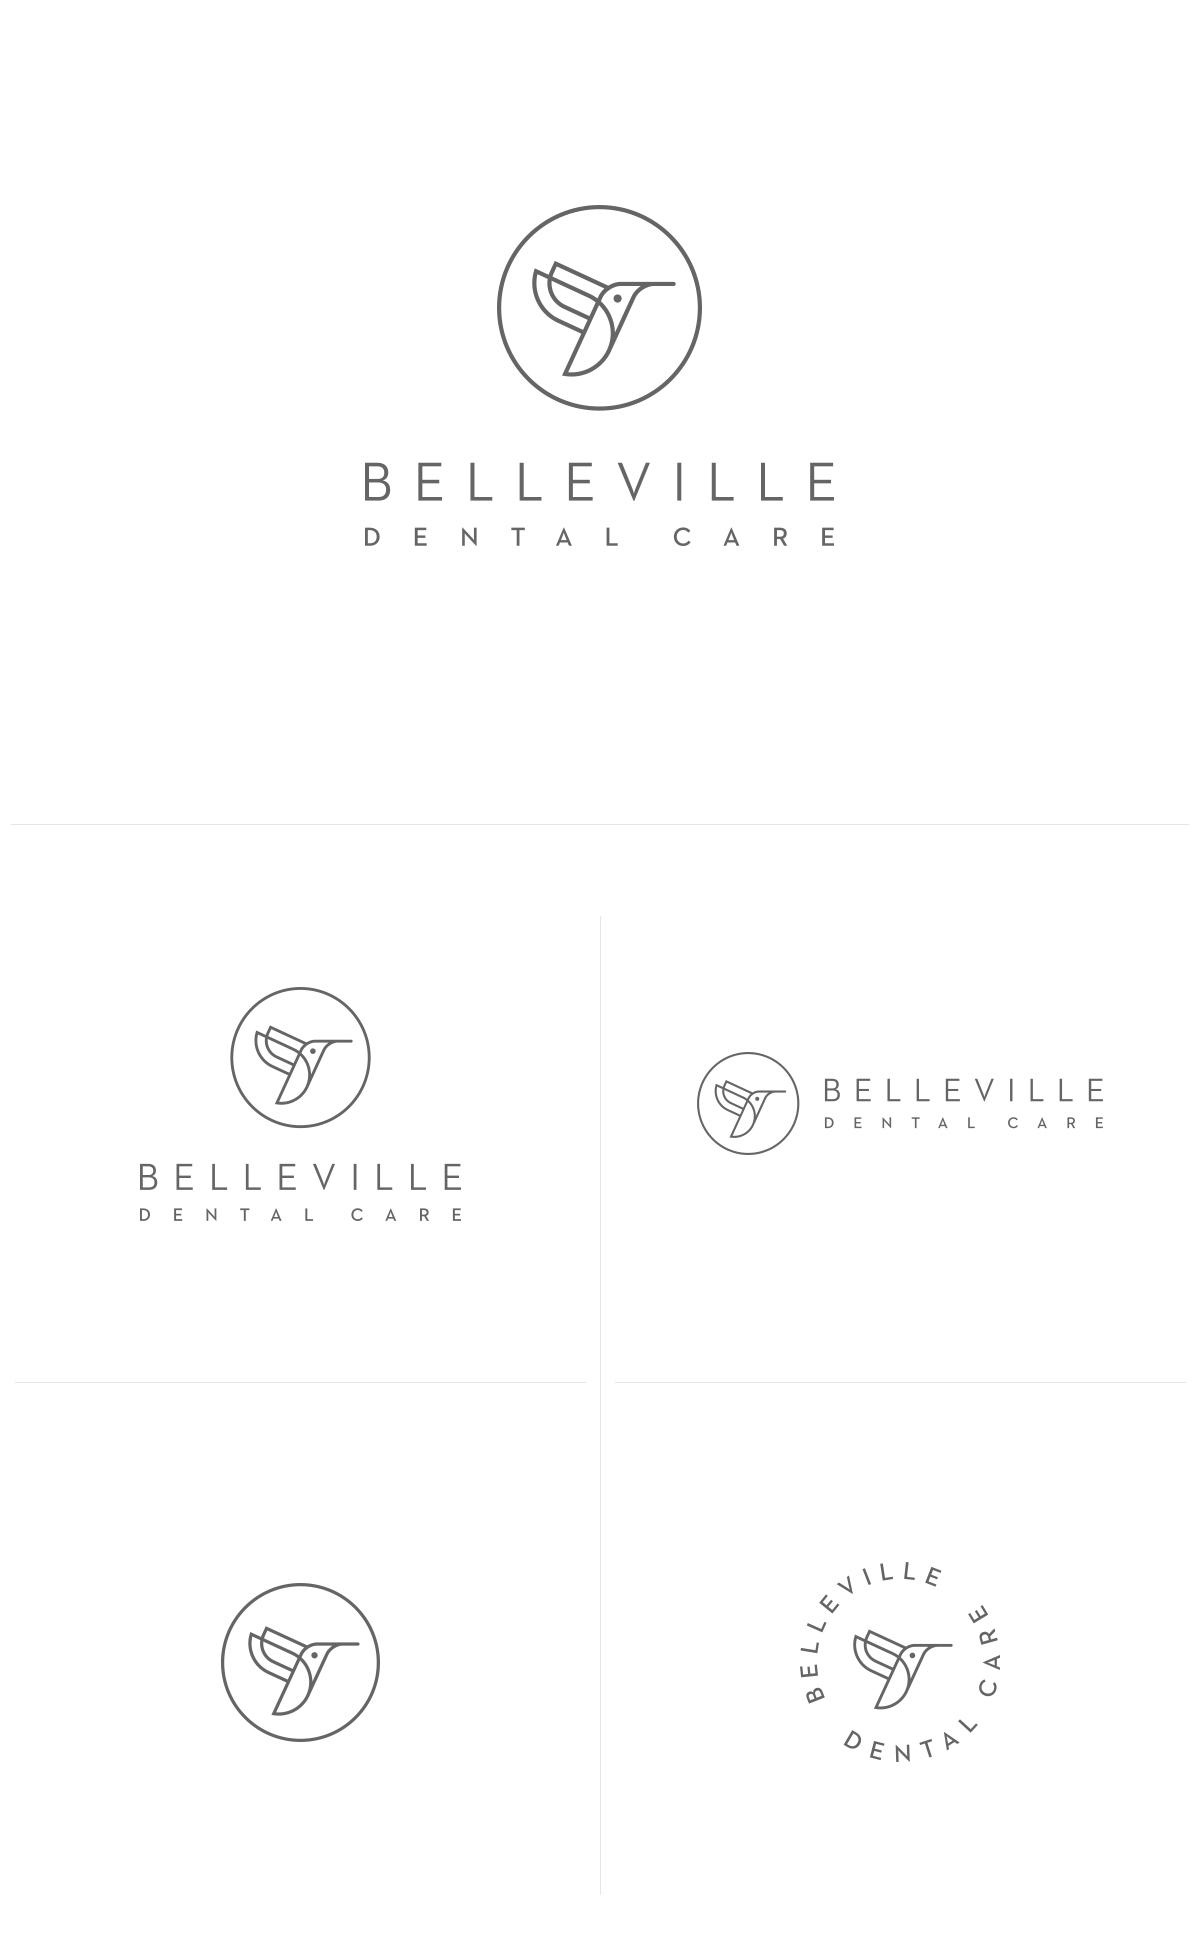 belleville-dental-dentist-brand-04.jpg